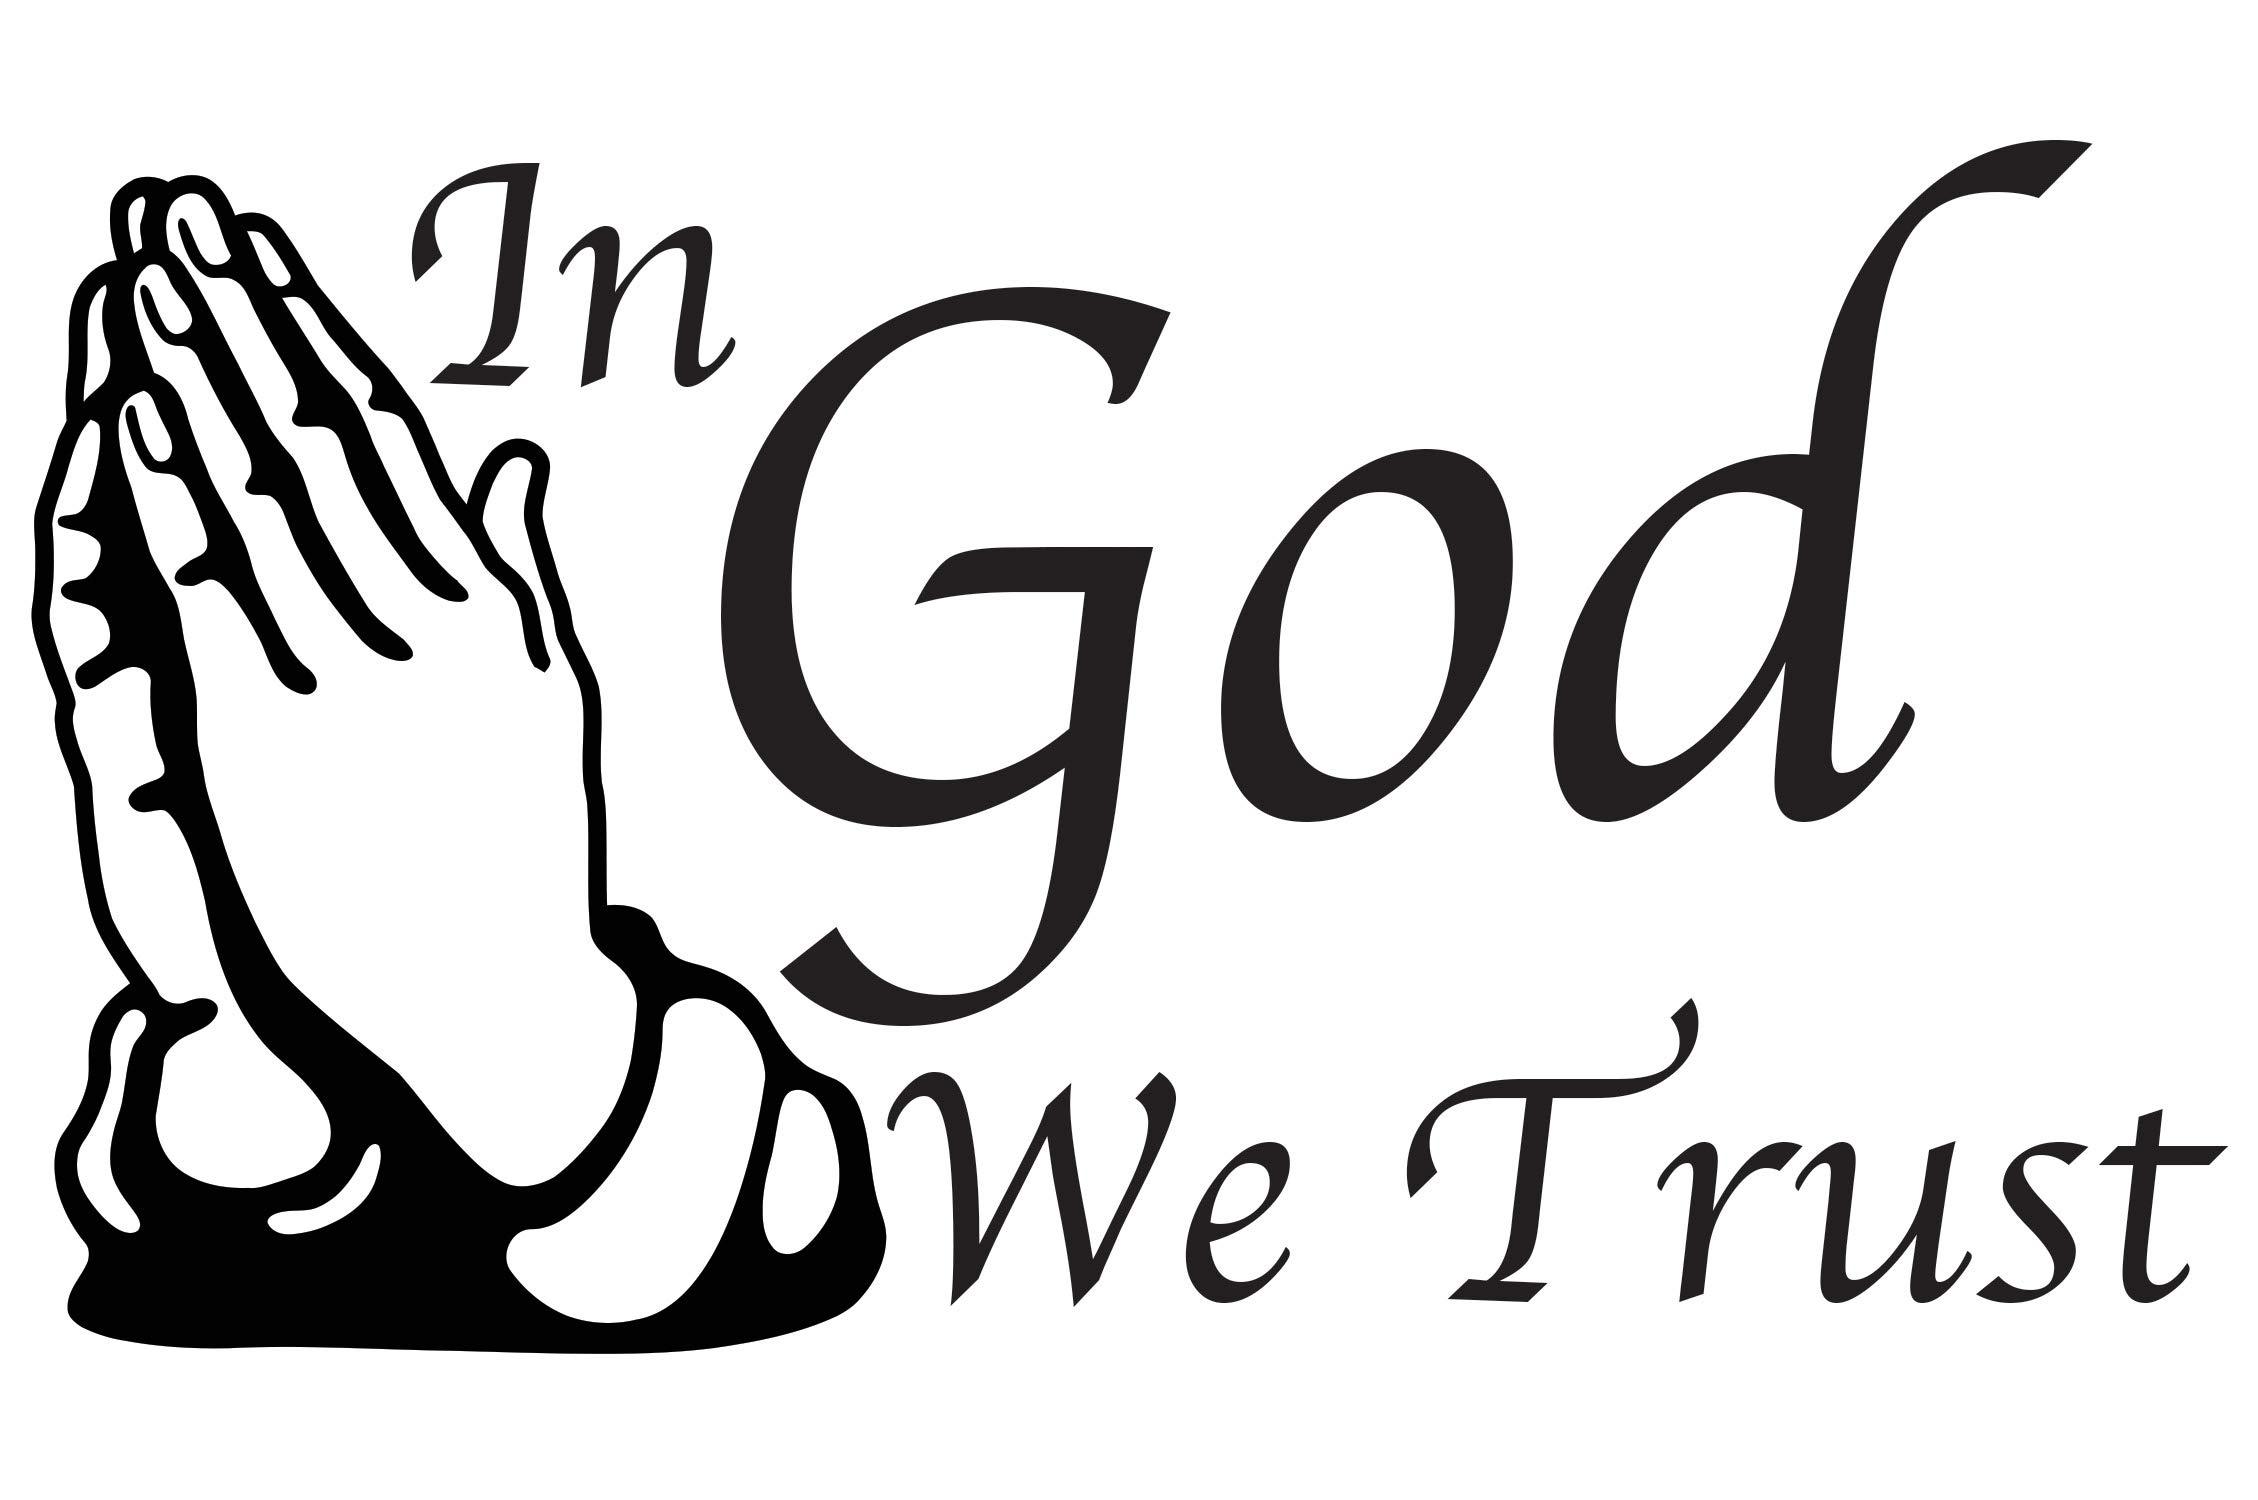 Frankies Cajun Customs in God We Trust Vinyl Decal, Wall, Car, Laptop - Burnt Orange - 50 inch